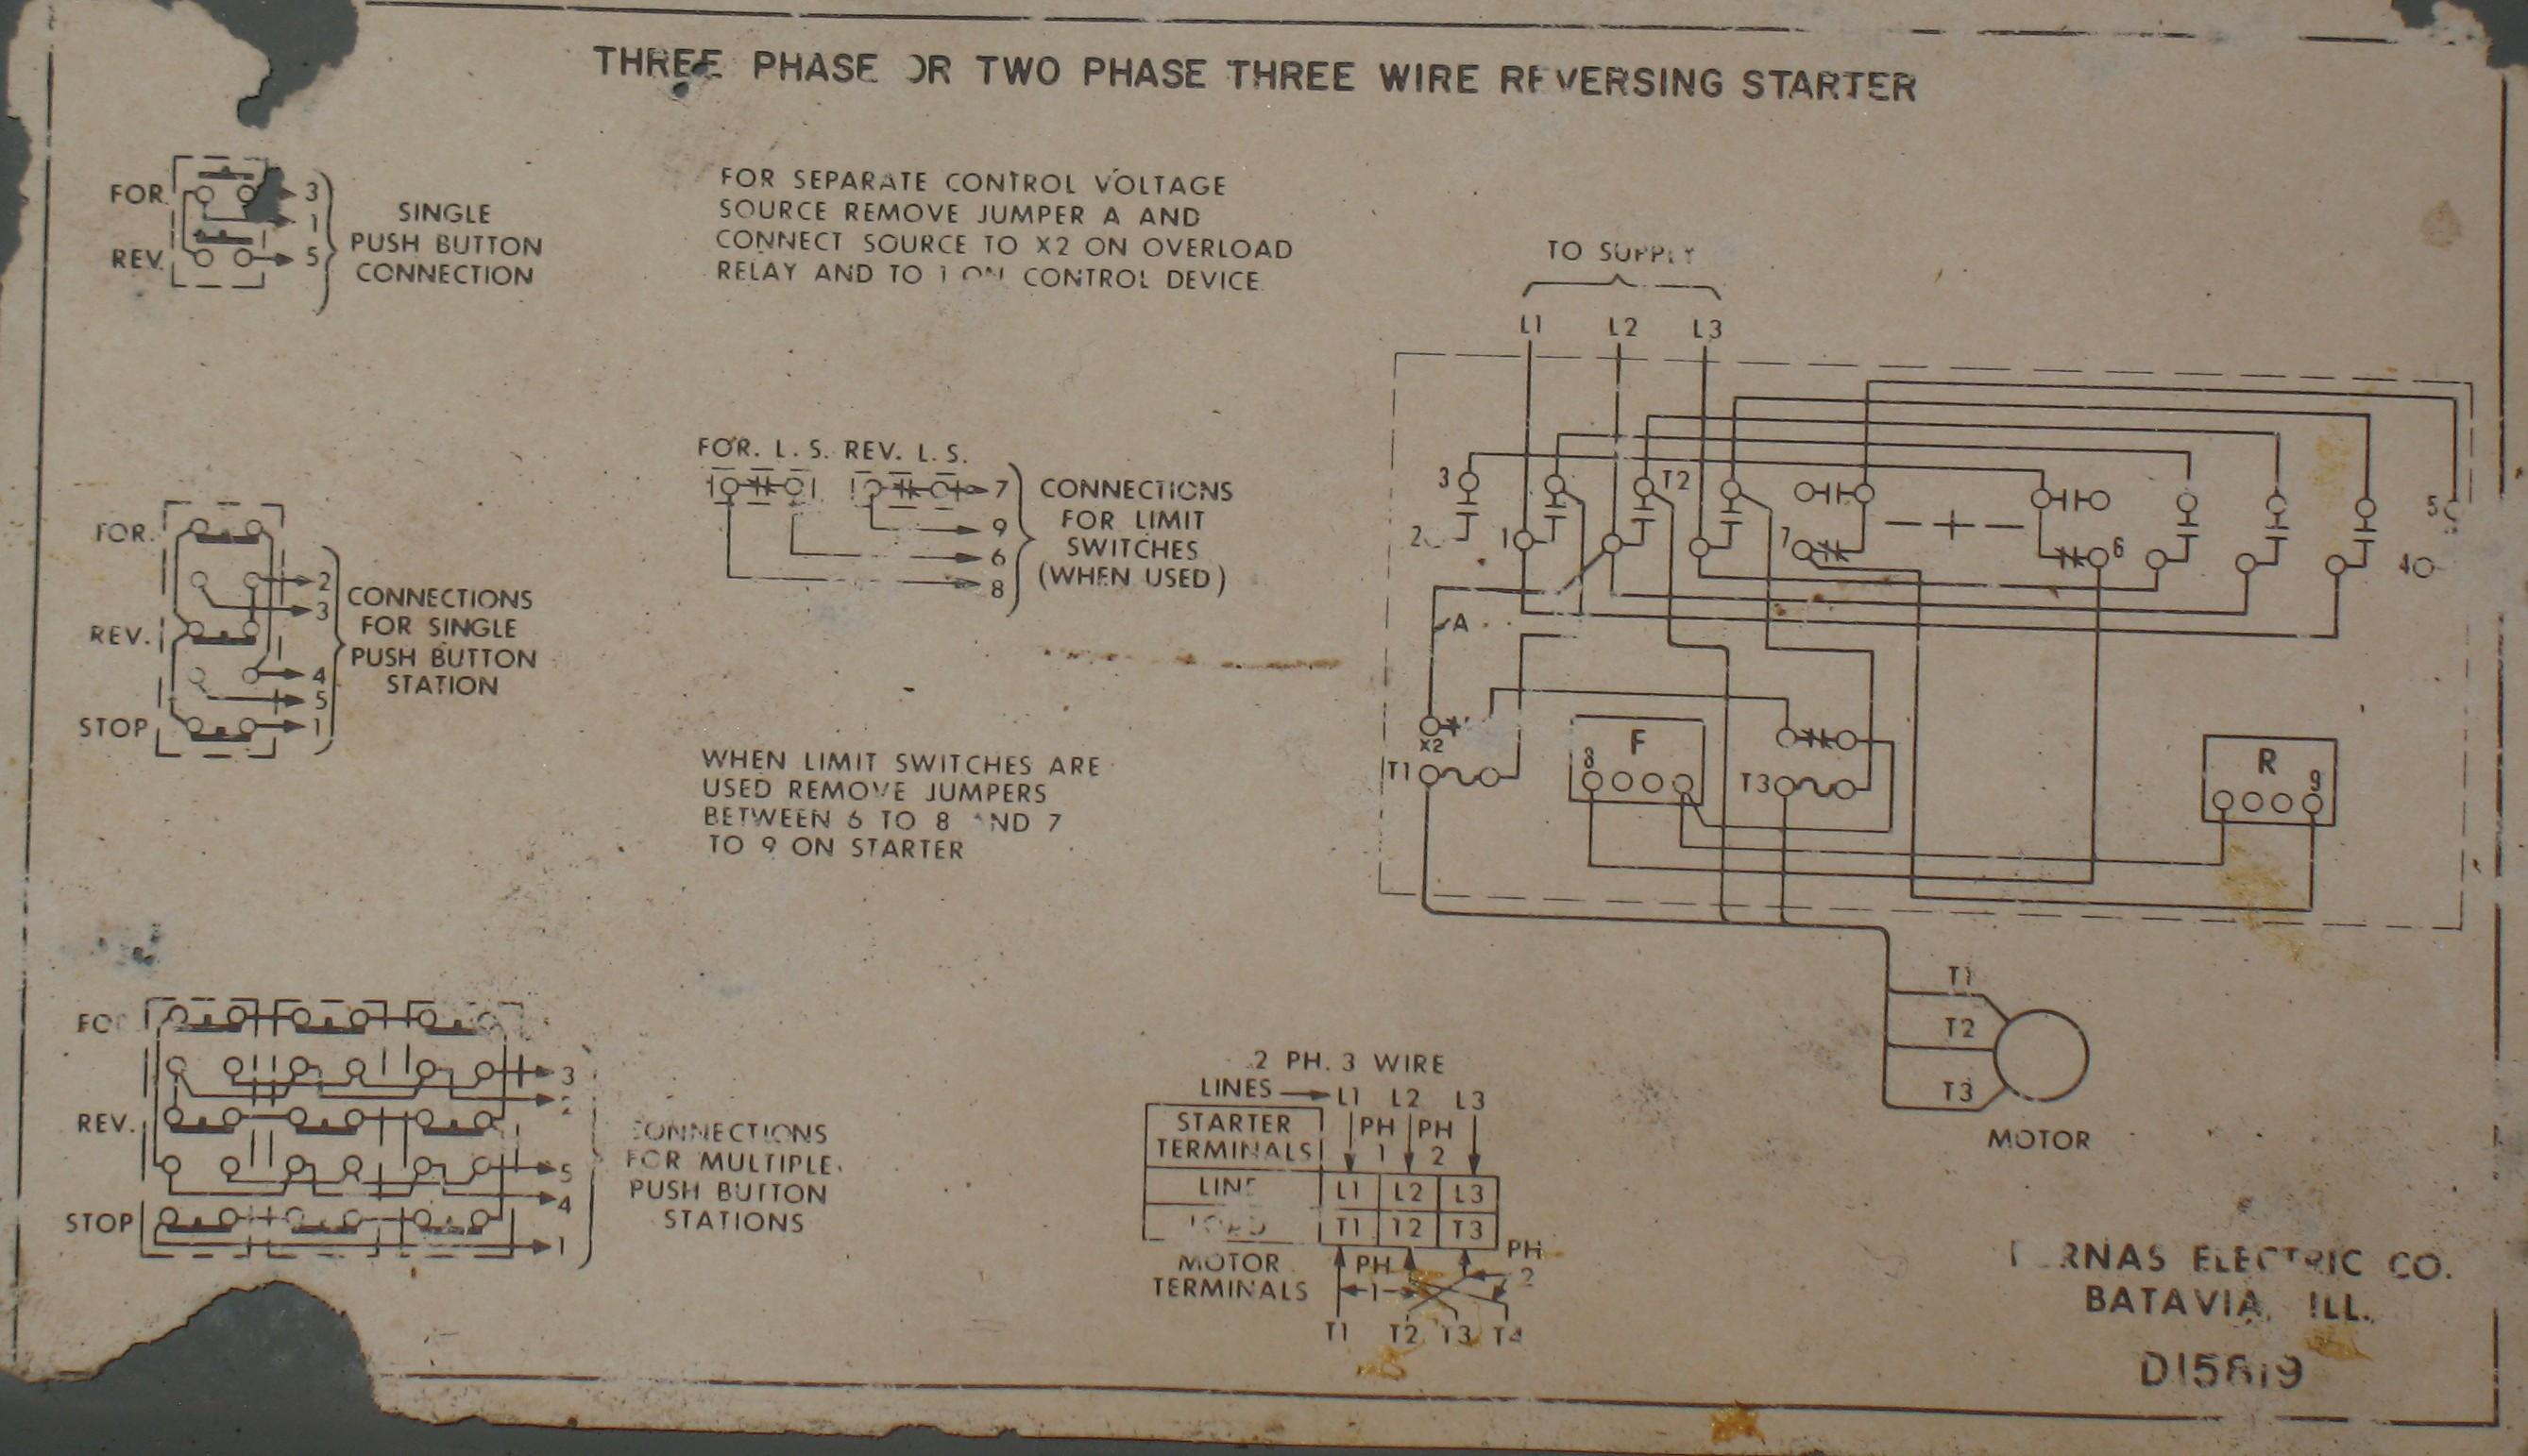 doerr motor wiring diagram weg single phase compressor lr22132 garage door